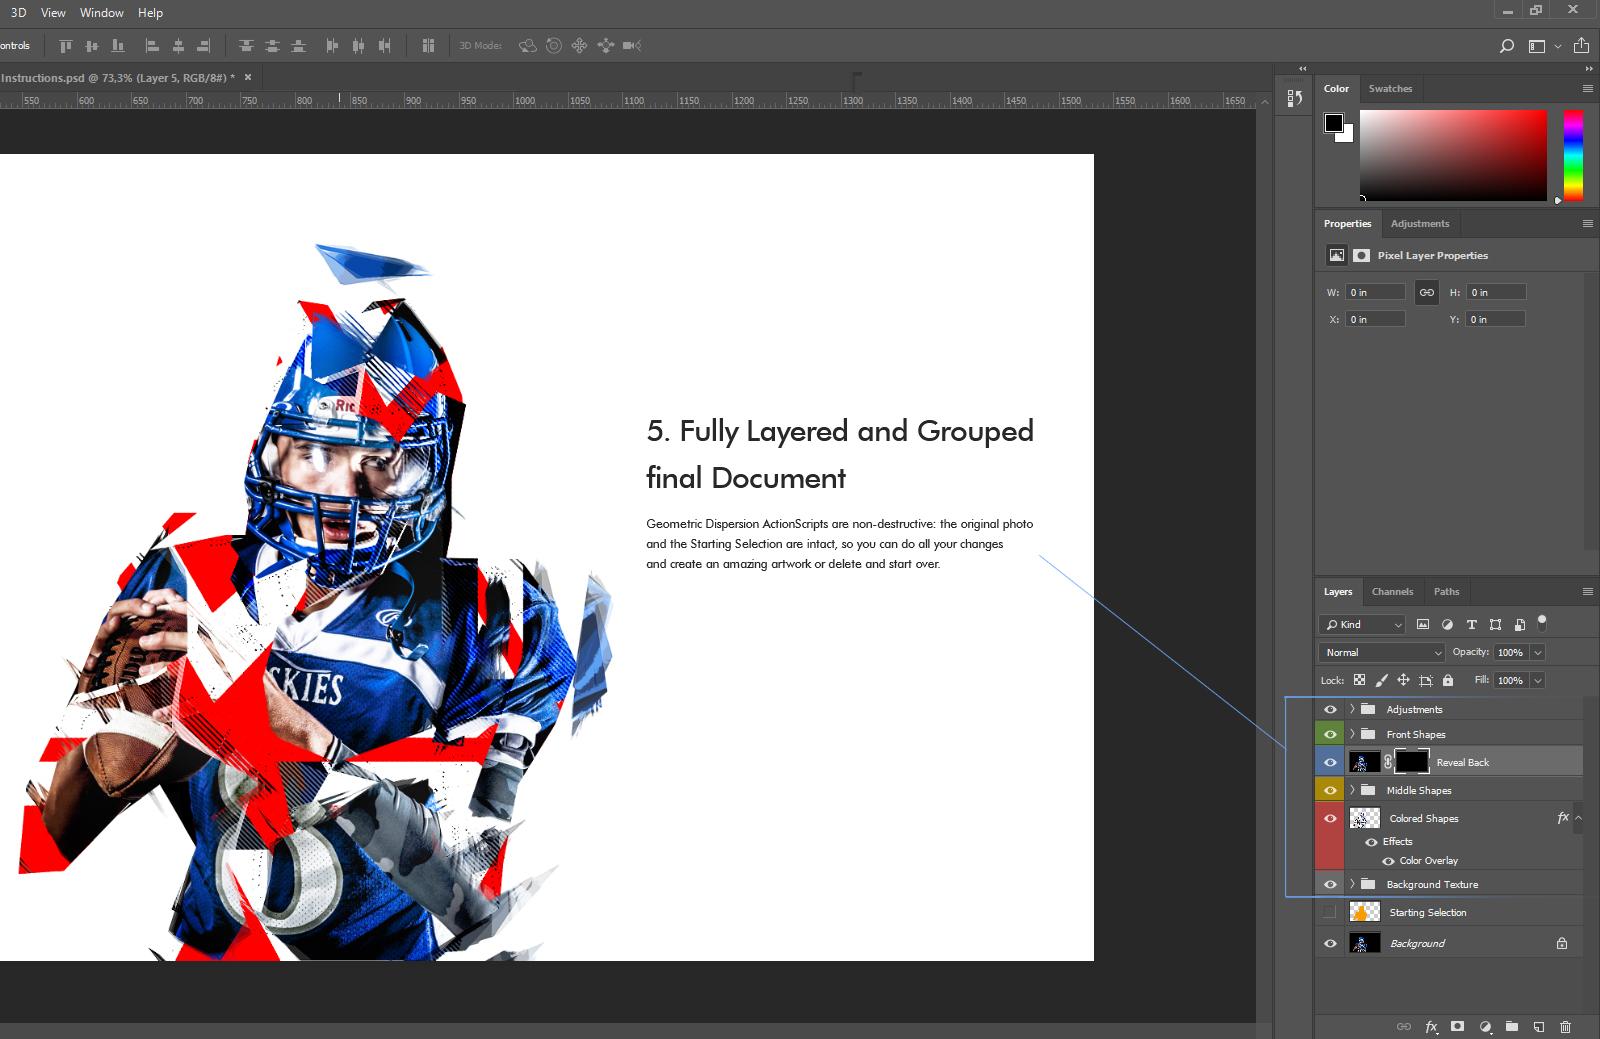 Geometrical Dispersion FX - Photoshop Add-On